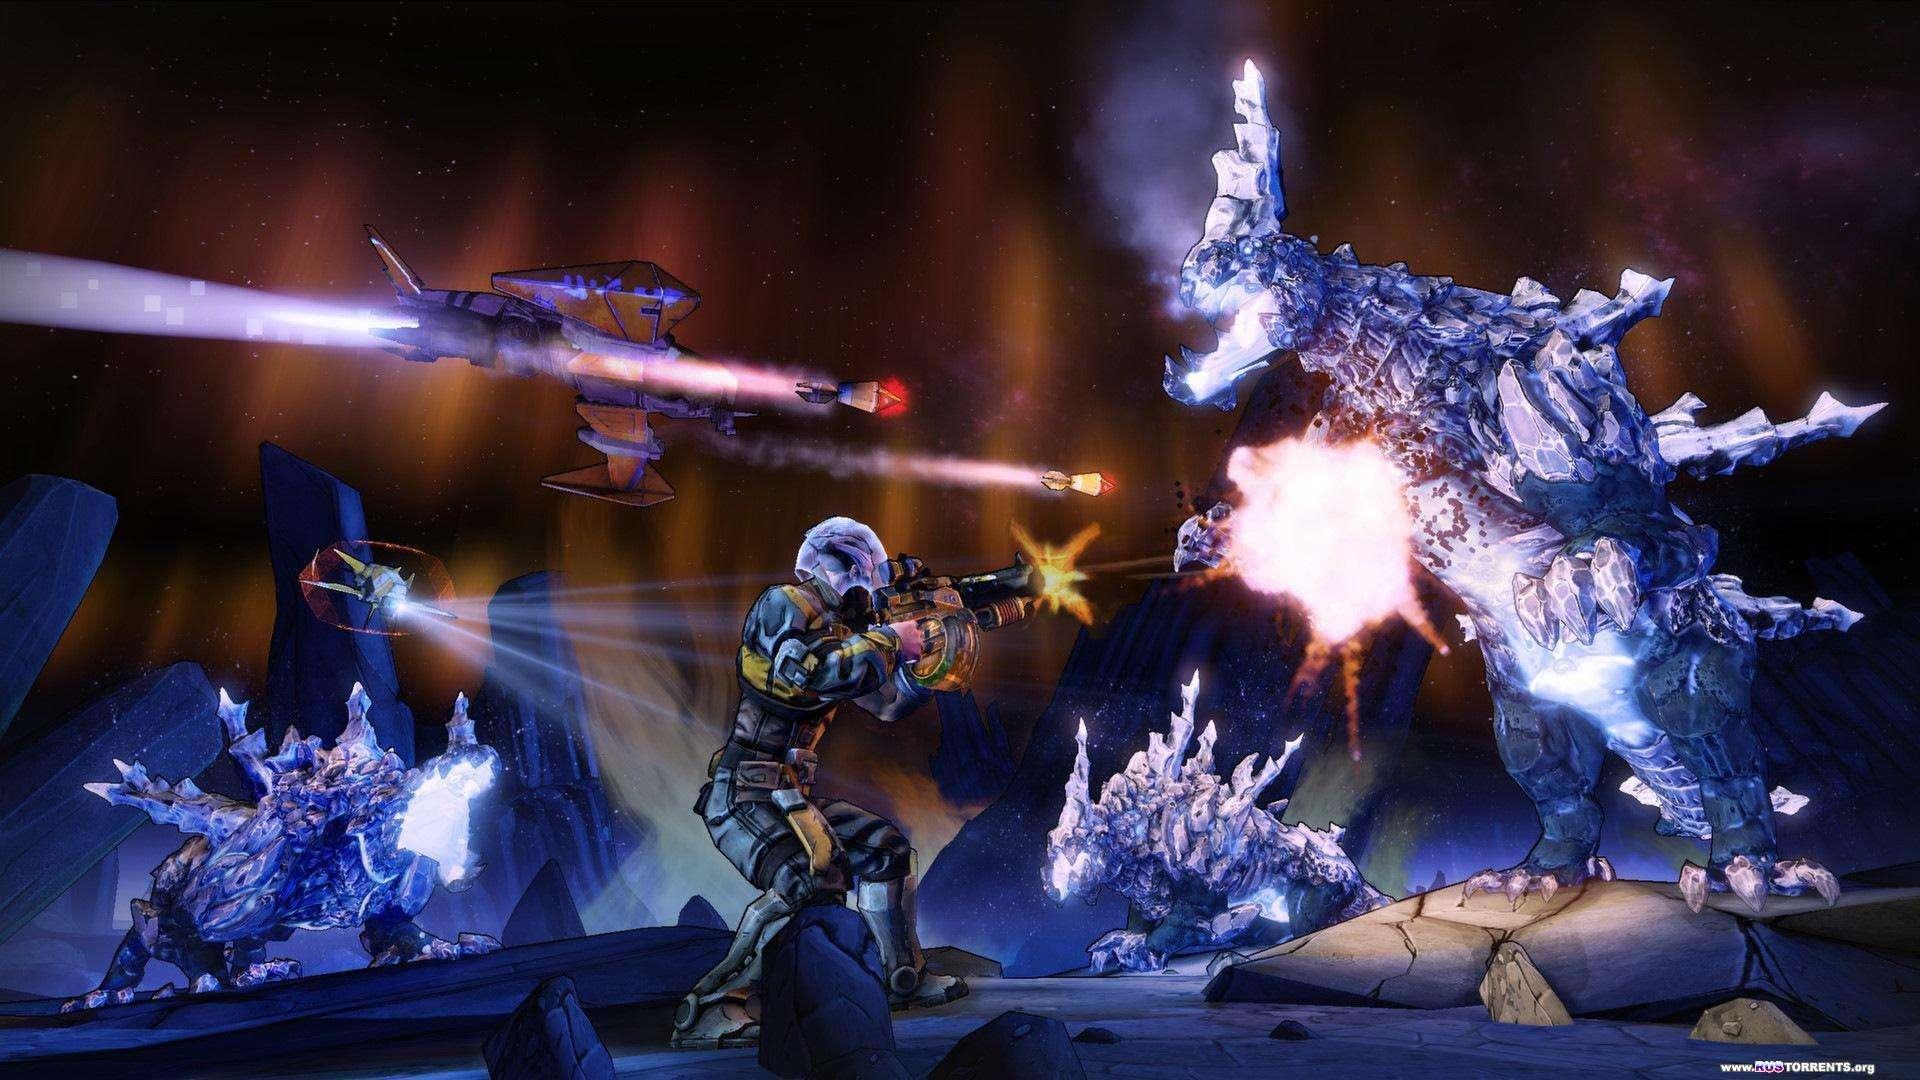 Borderlands: The Pre-Sequel [v 1.0.7 + 6 DLC] | PC | RePack от R.G. Механики